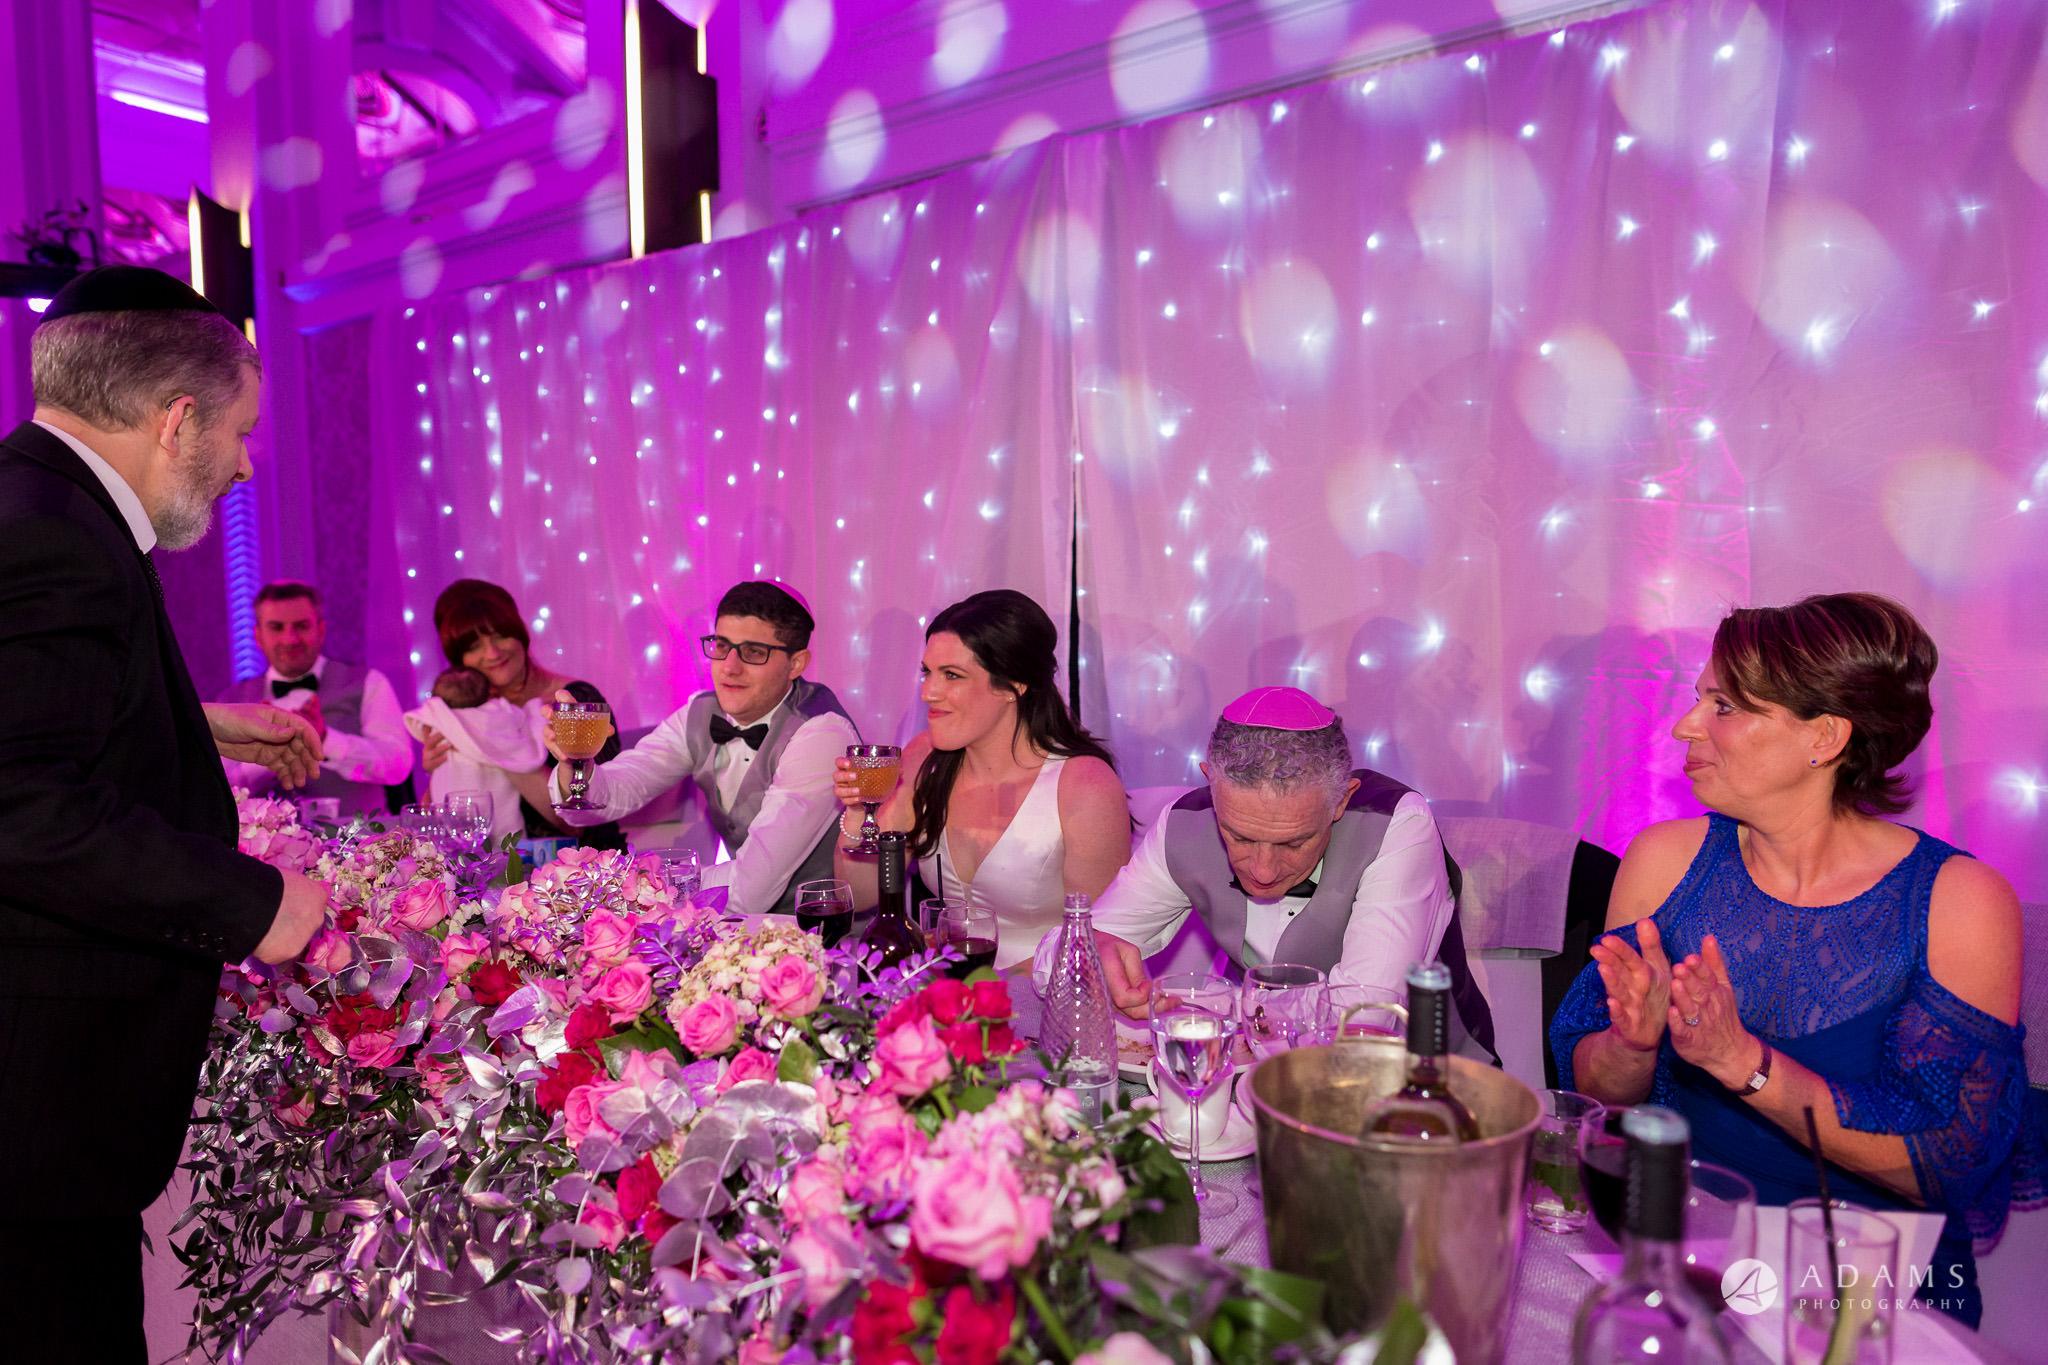 Grand connaught rooms rabbi take wine